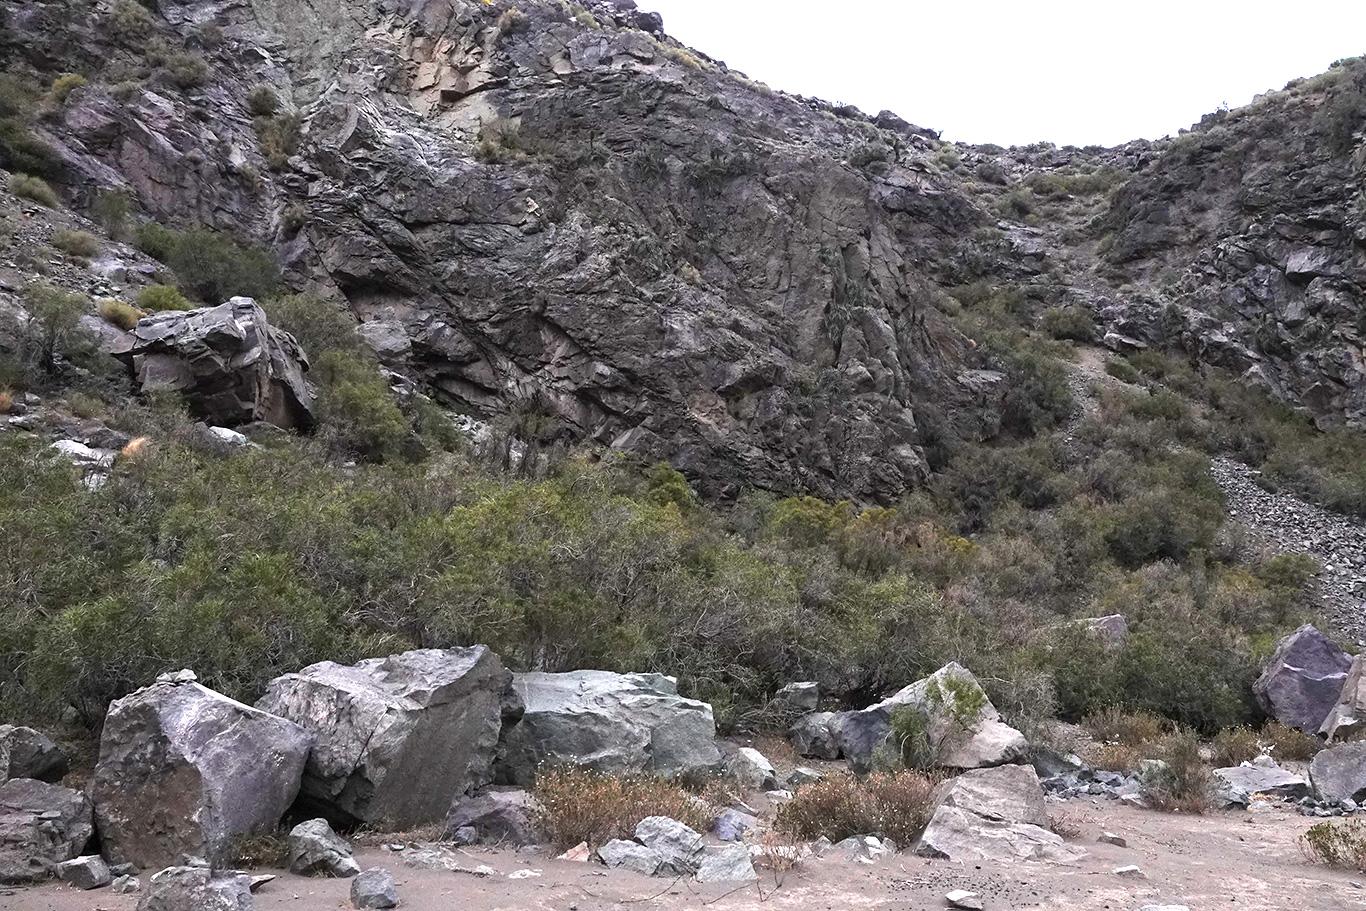 Habitat of Crag Chilia, Camino Embalse El Yeso, Chile.